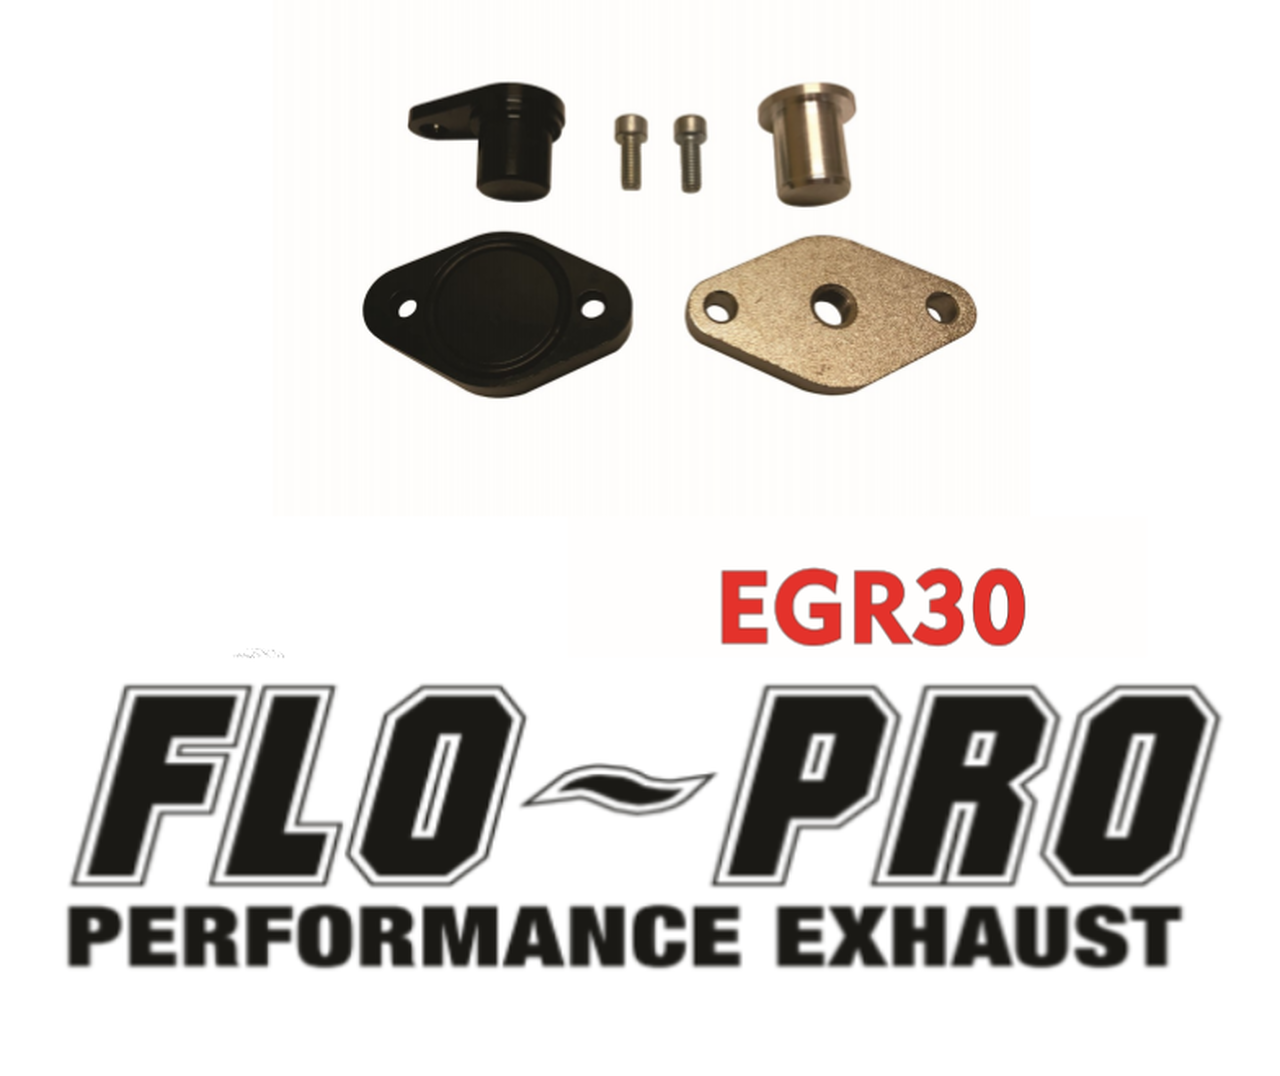 18-20 Ford F-150  3.0L Powerstroke, FLO-PRO EGR Delete Kit